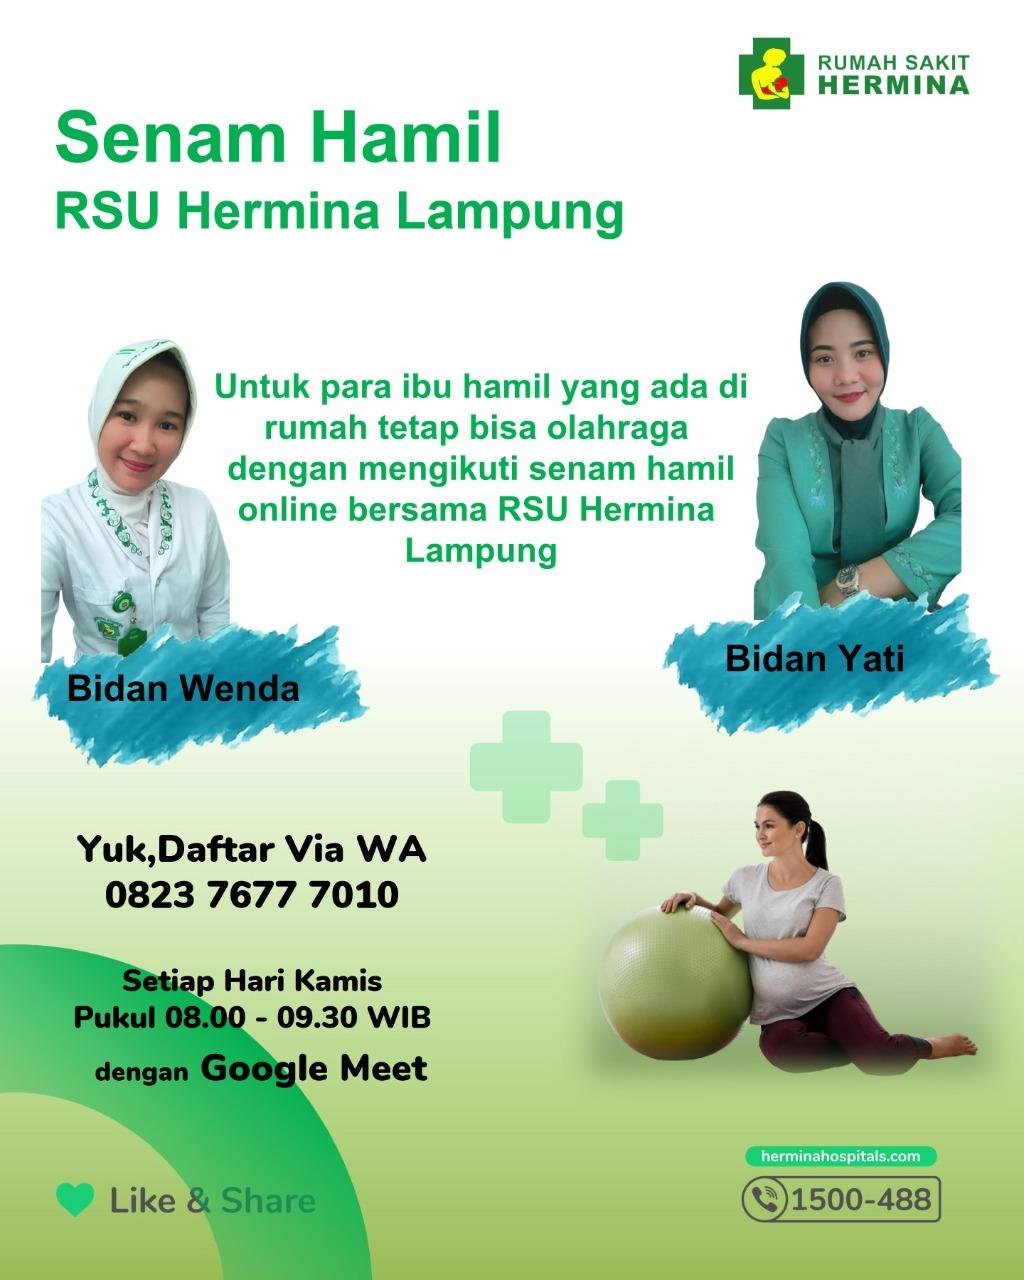 Hermina Hospitals | Senam Sehat Online